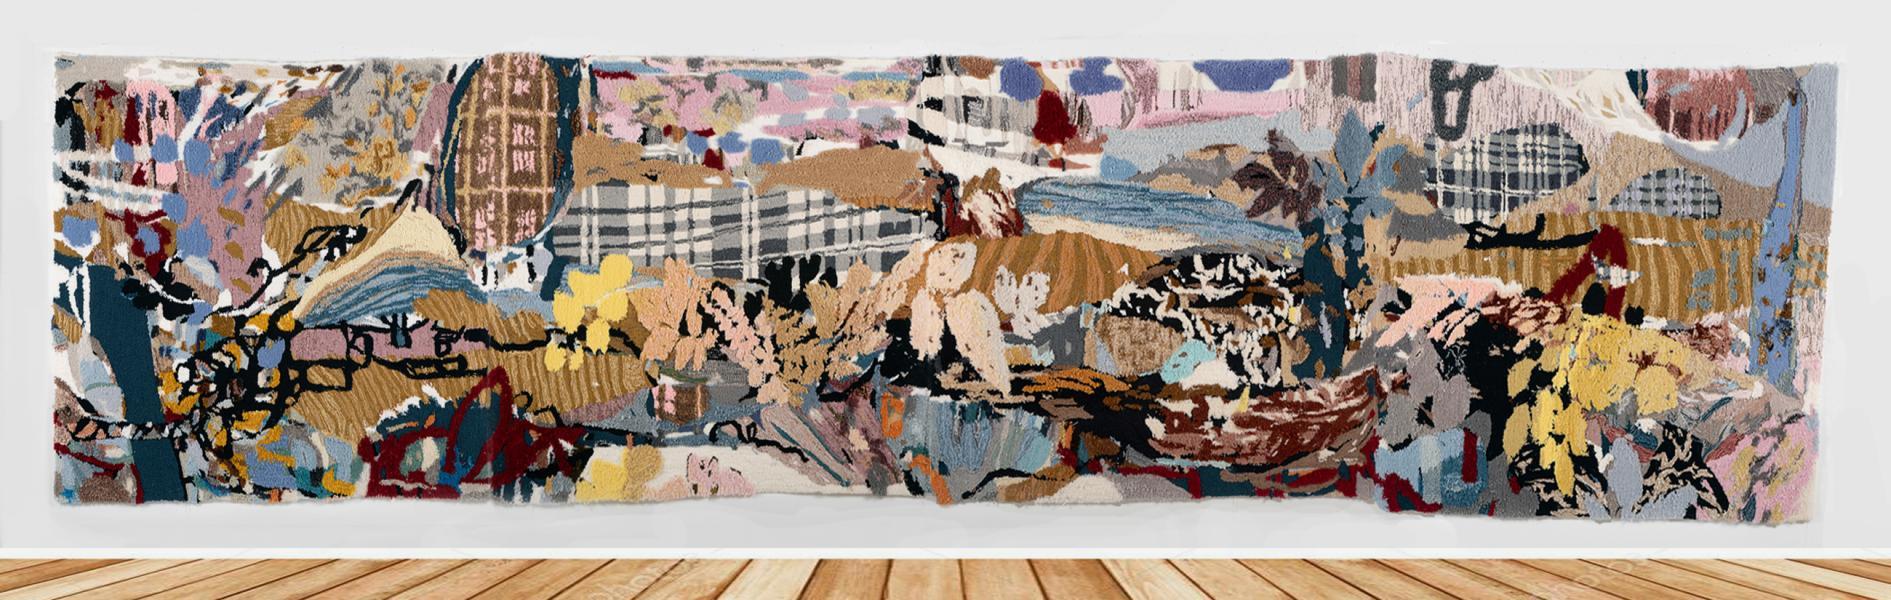 textile rug wall piece